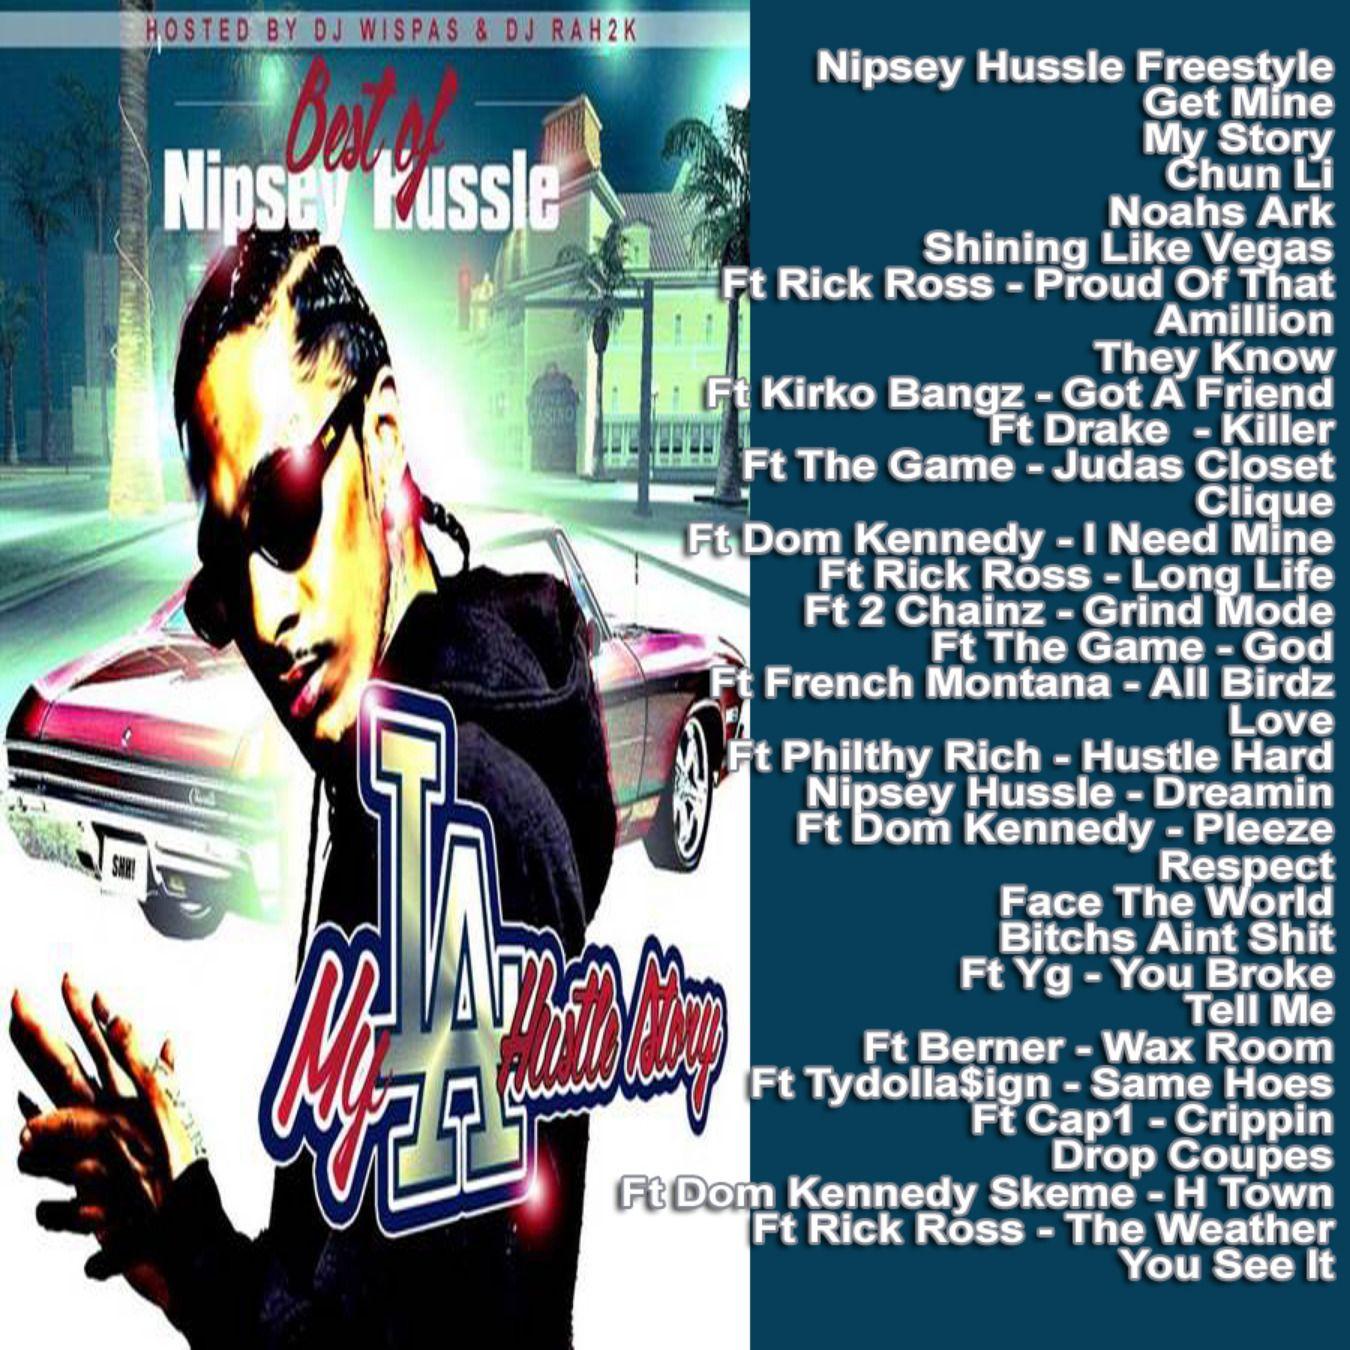 Nipsey Hussle My La Story Mp3 Download In 2020 Mixtape G Funk Dj Premier